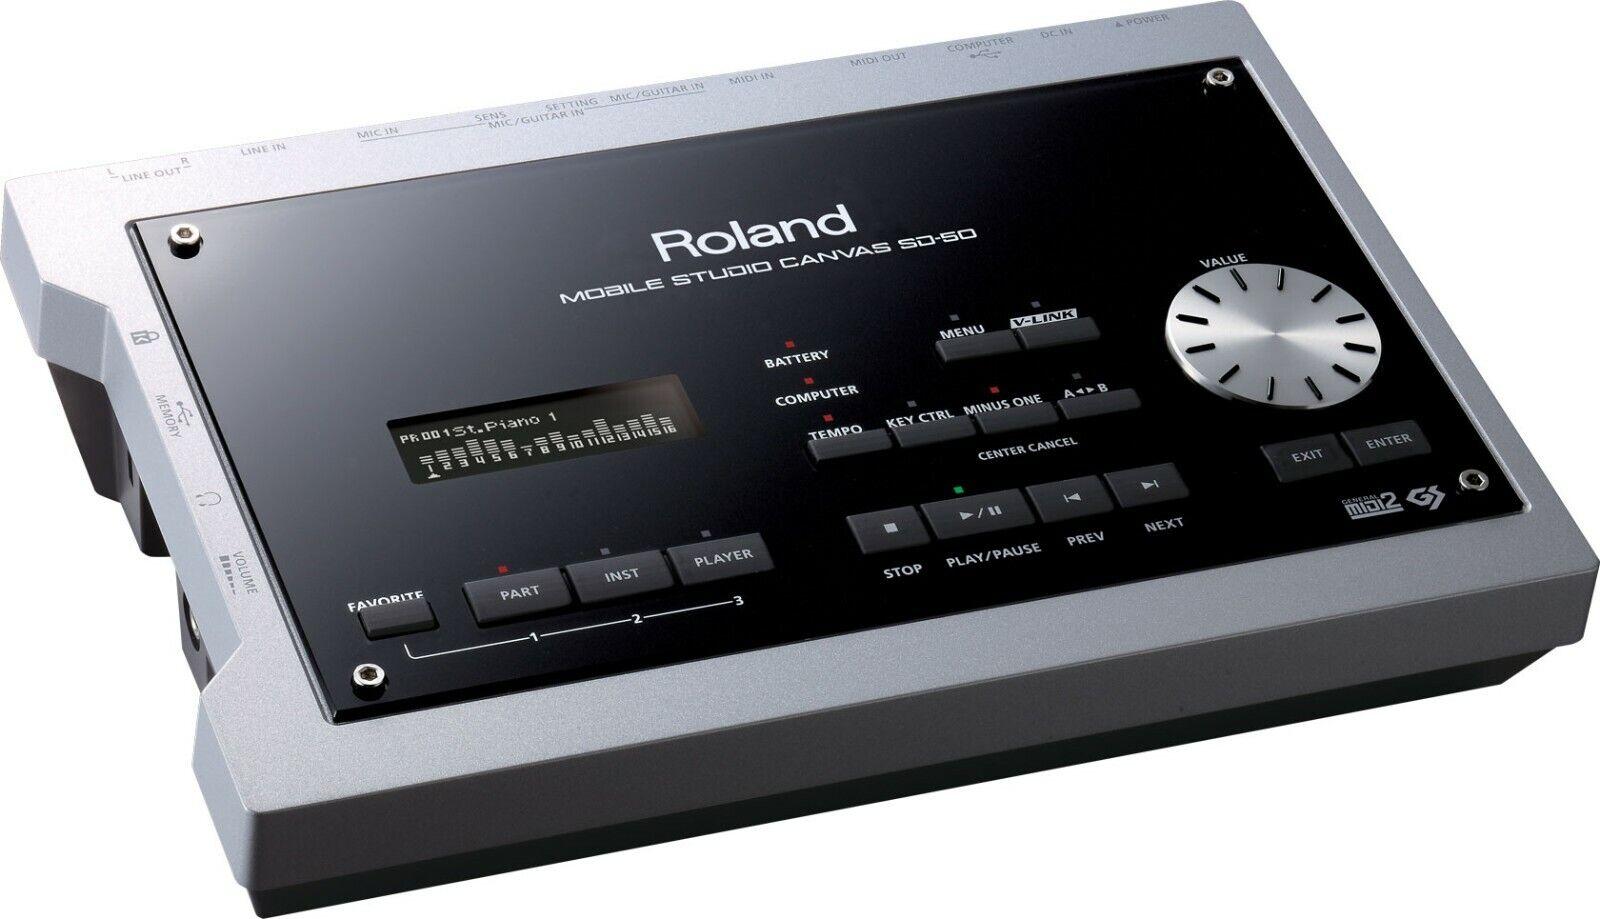 Roland SD-50 Mobile Studio Canvas Mobile Sound Module with DAW Software